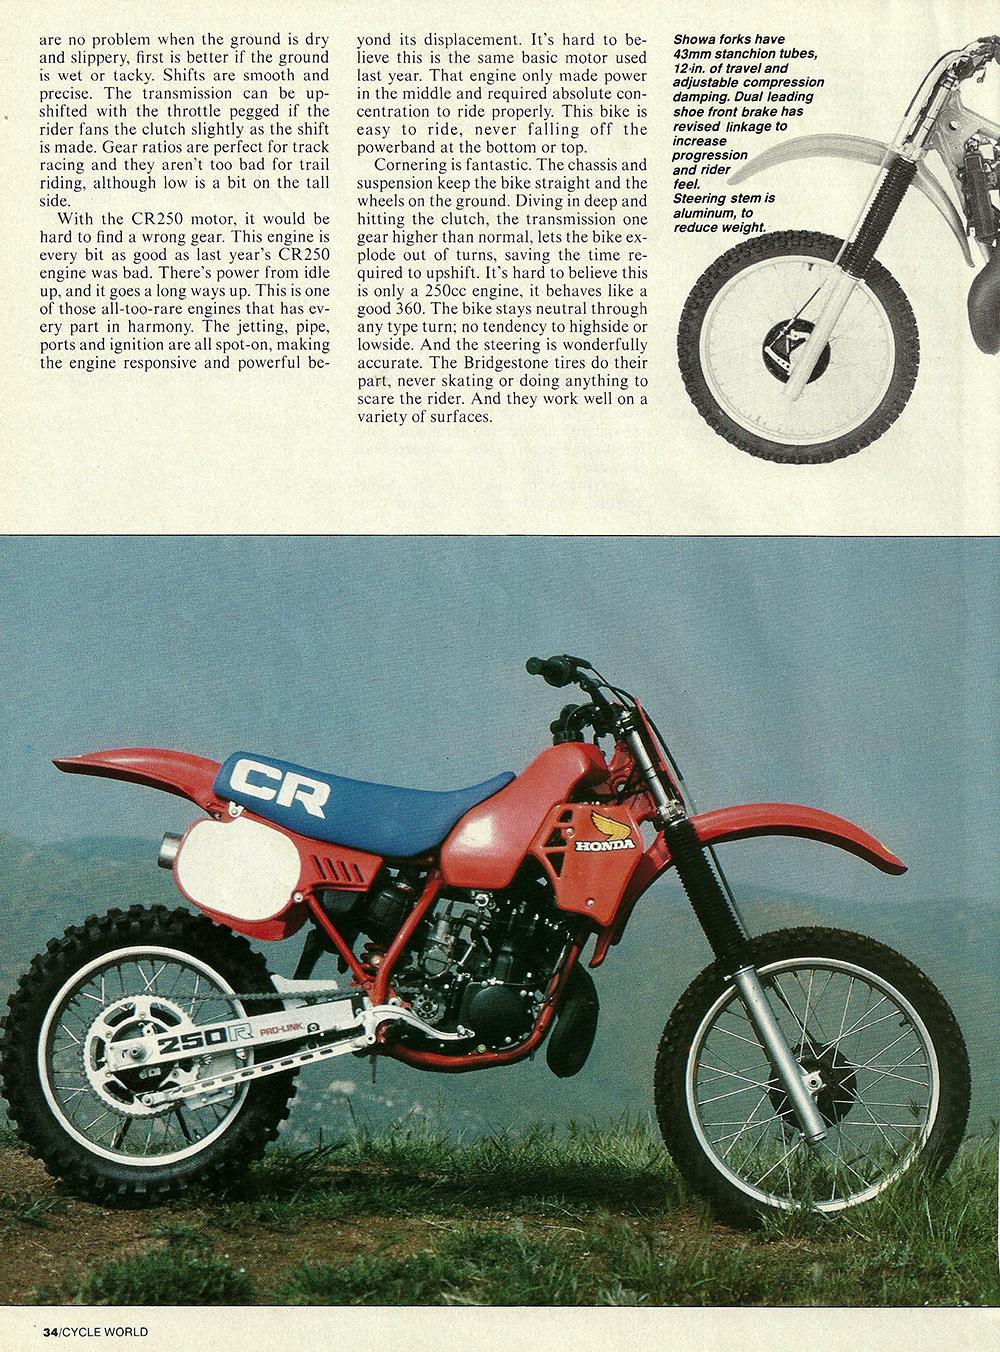 1983 Honda CR250R road test 03.jpg